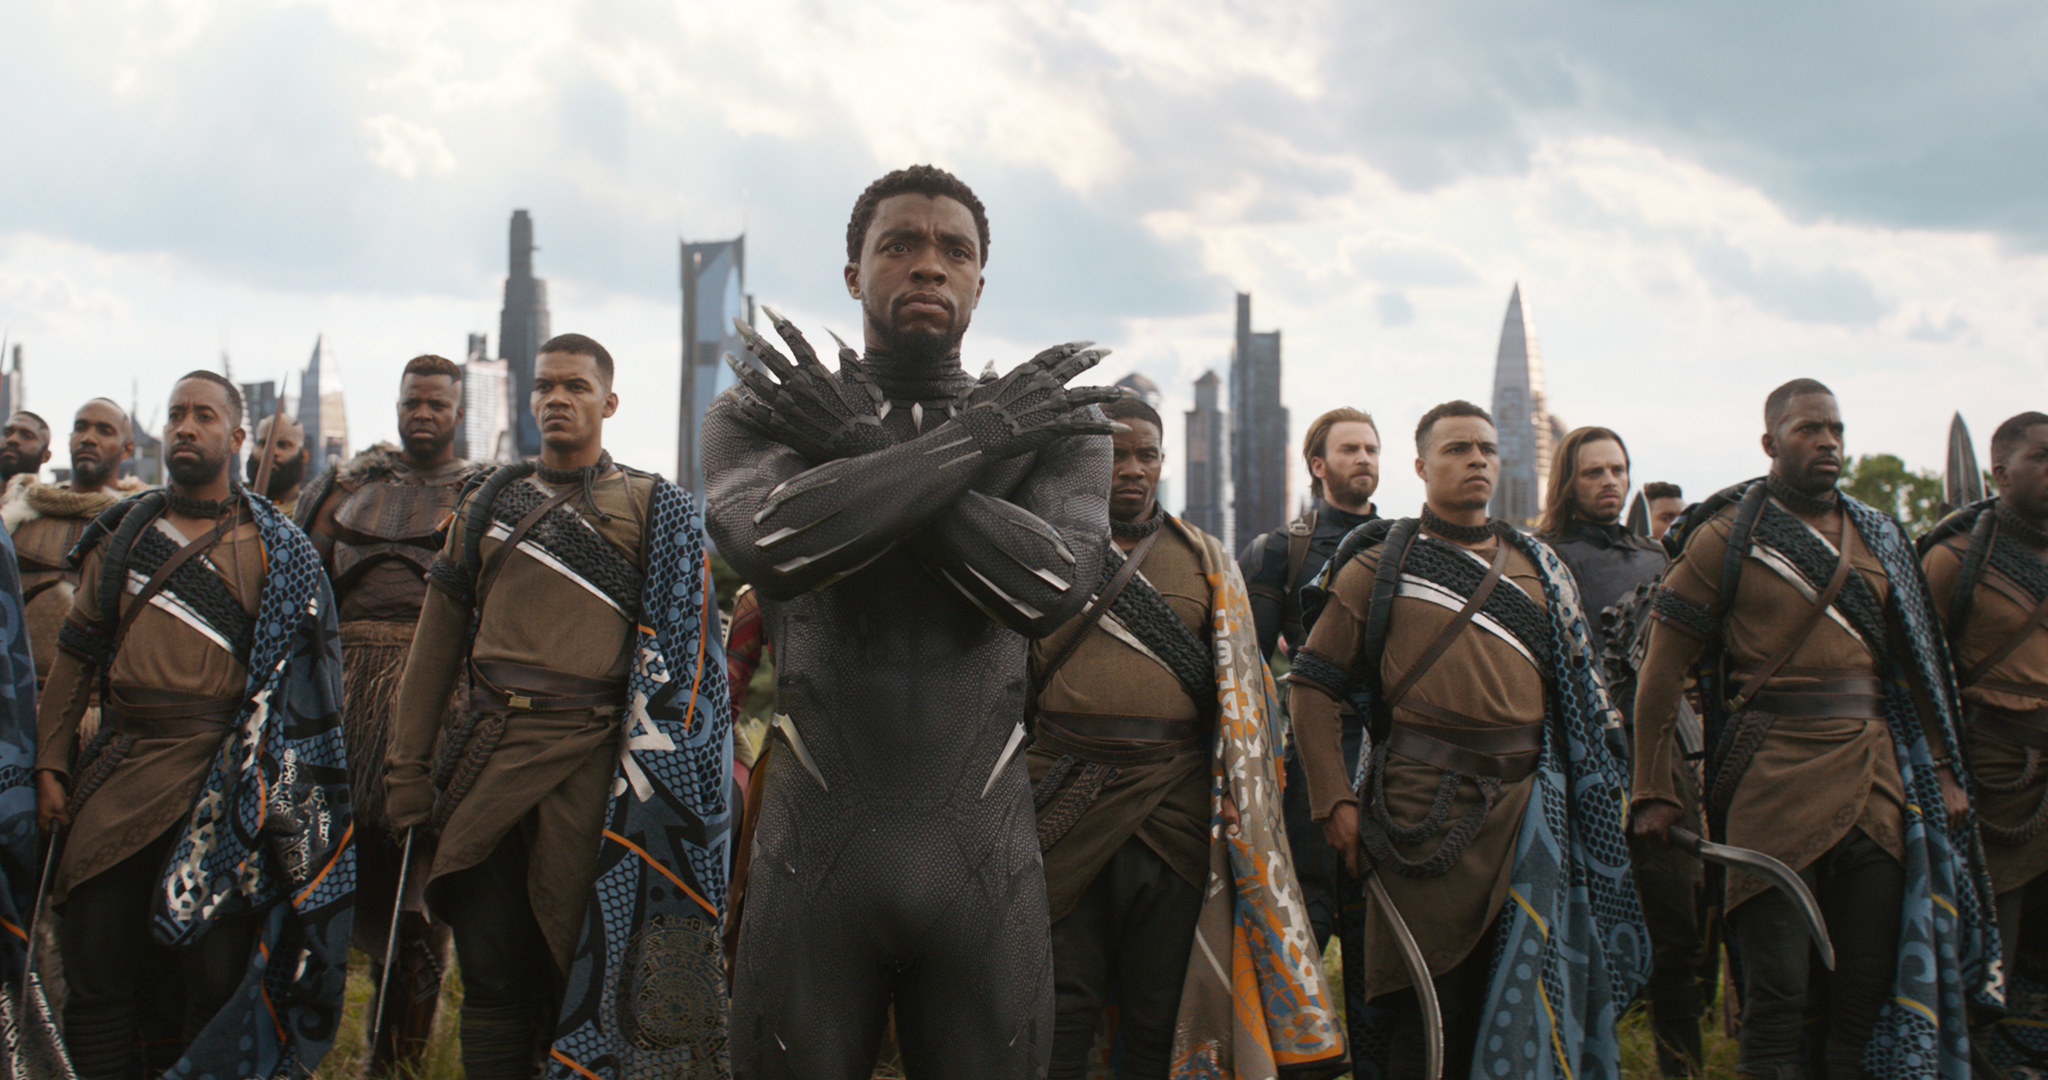 Winston Duke as M'Baku, Chadwick Boseman as Black Panther, Chris Evans as Captain America, Sebastian Stan as Winter Soldier in Avengers: Infinity War